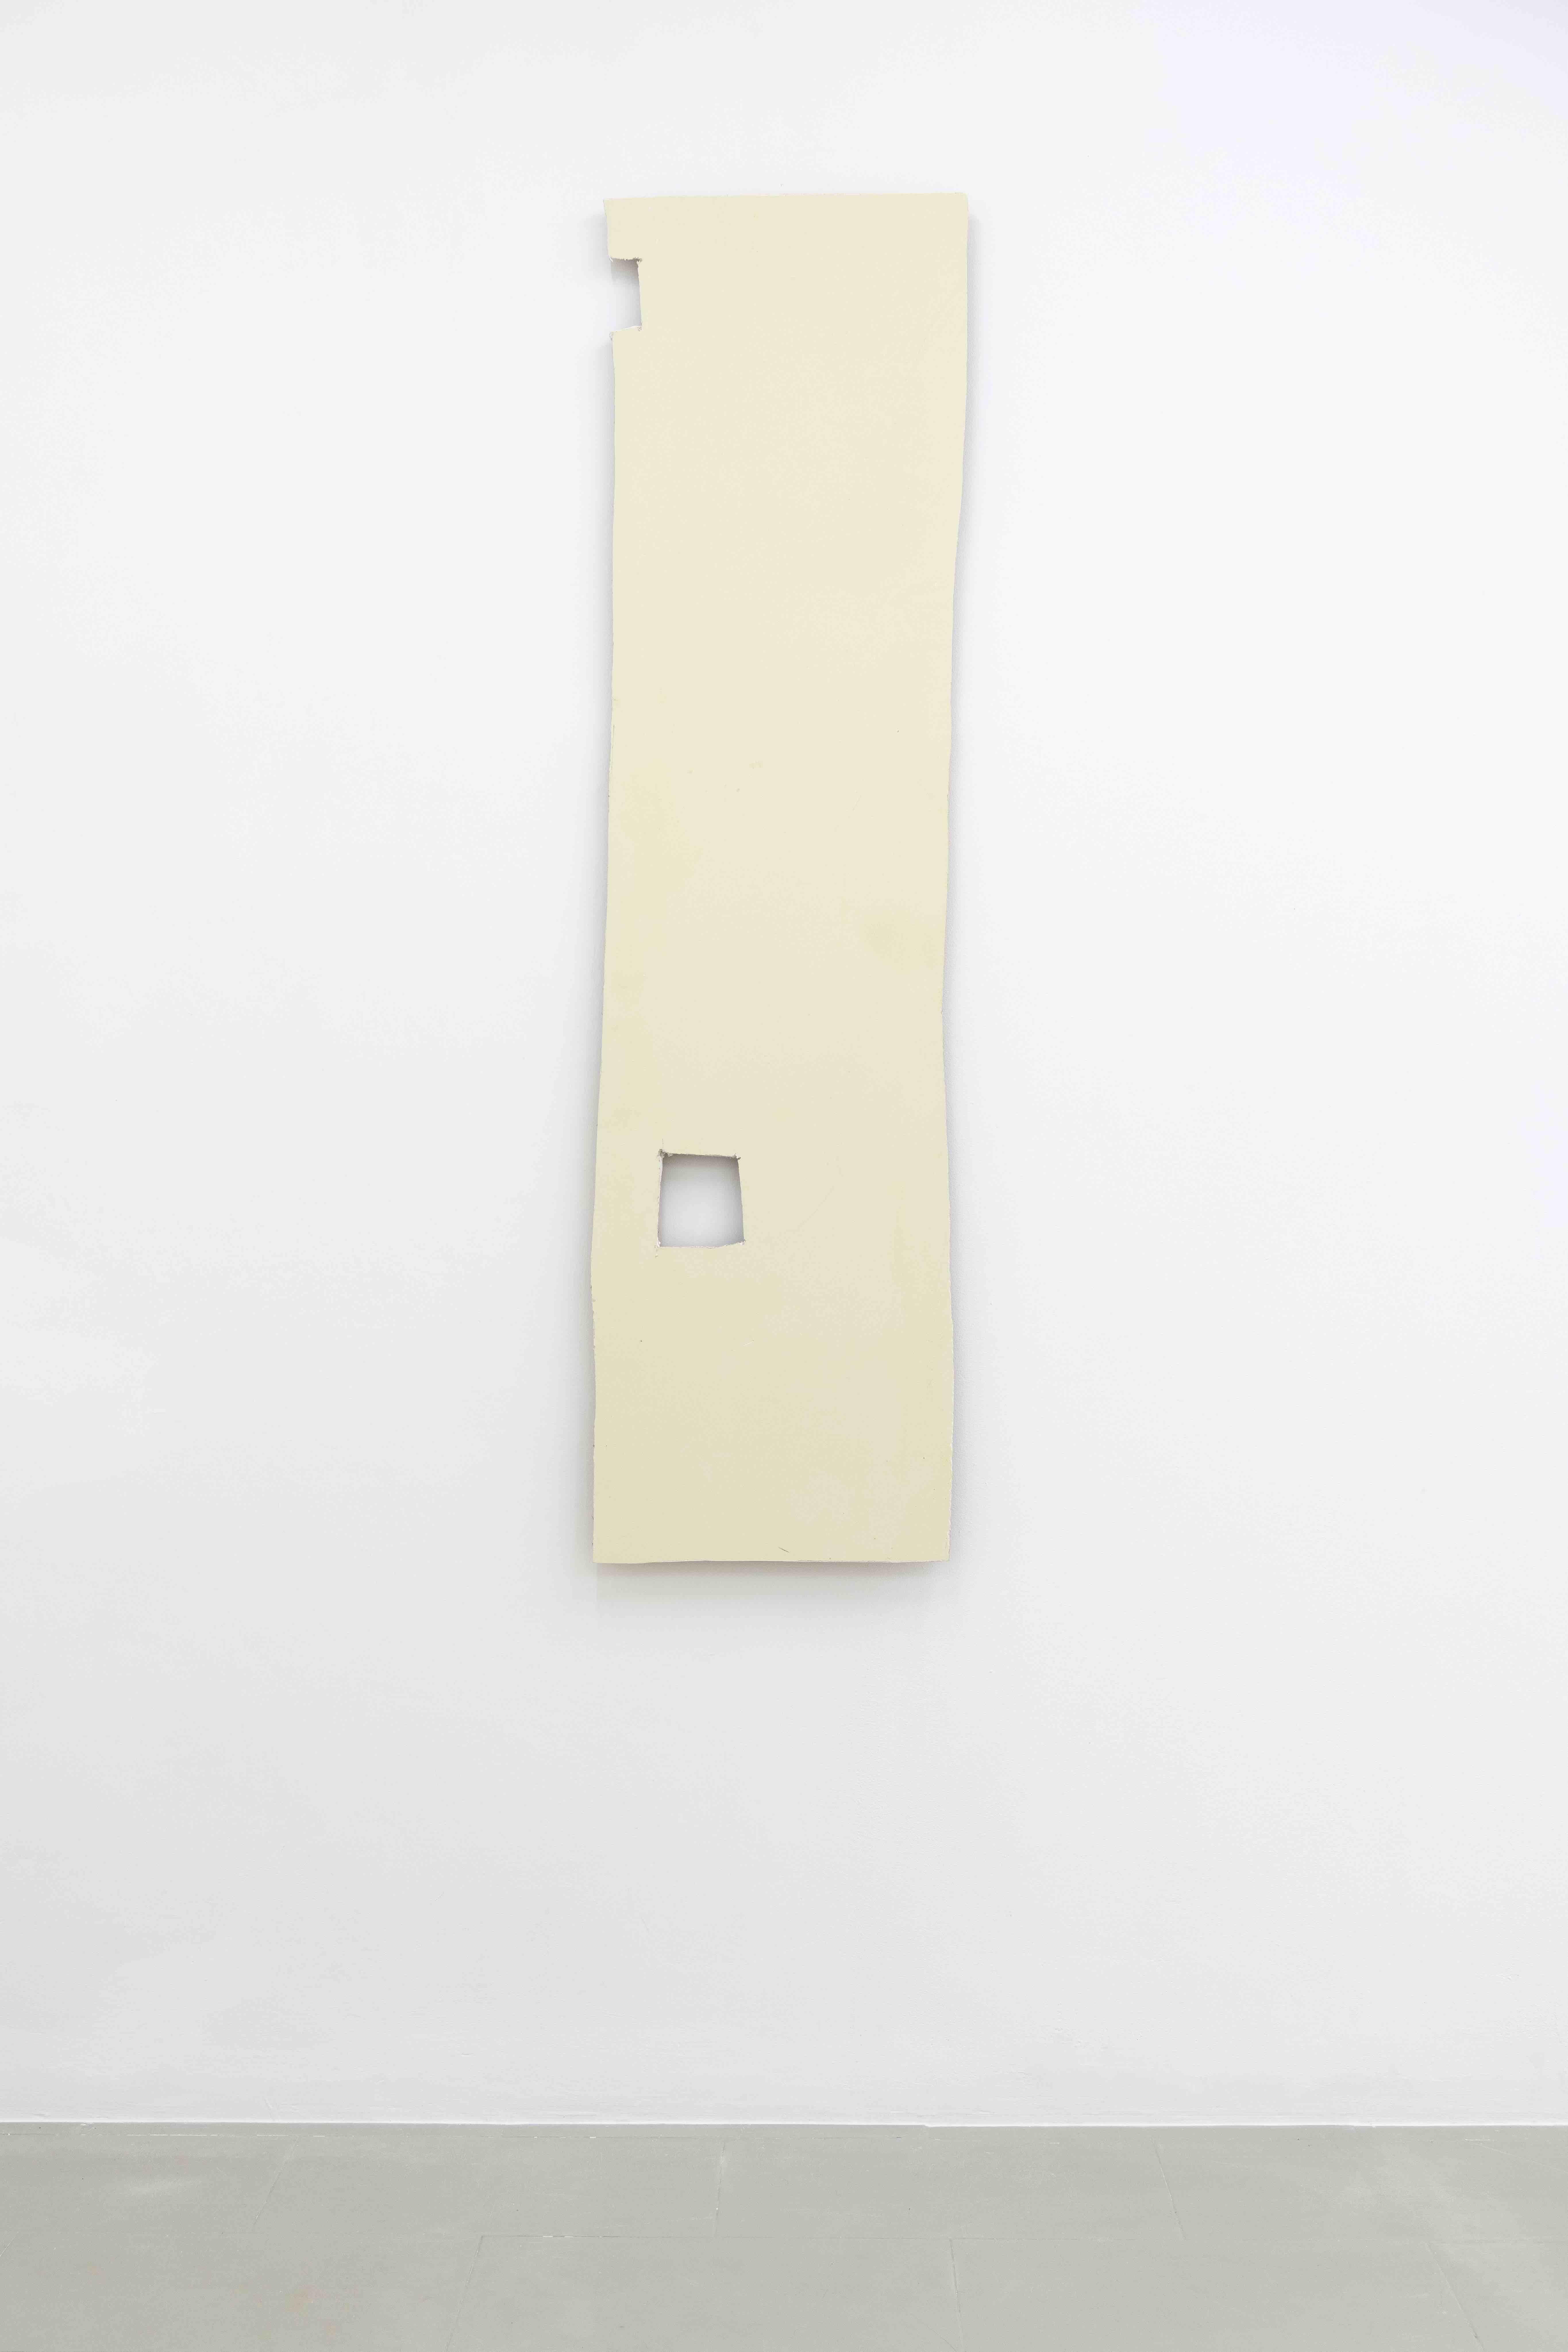 Plamen Dejanoff, Untitled (Palais Slav) 2019, Plasterboard wall, 190 x 51cm, Galerie Emanuel Layr Rome